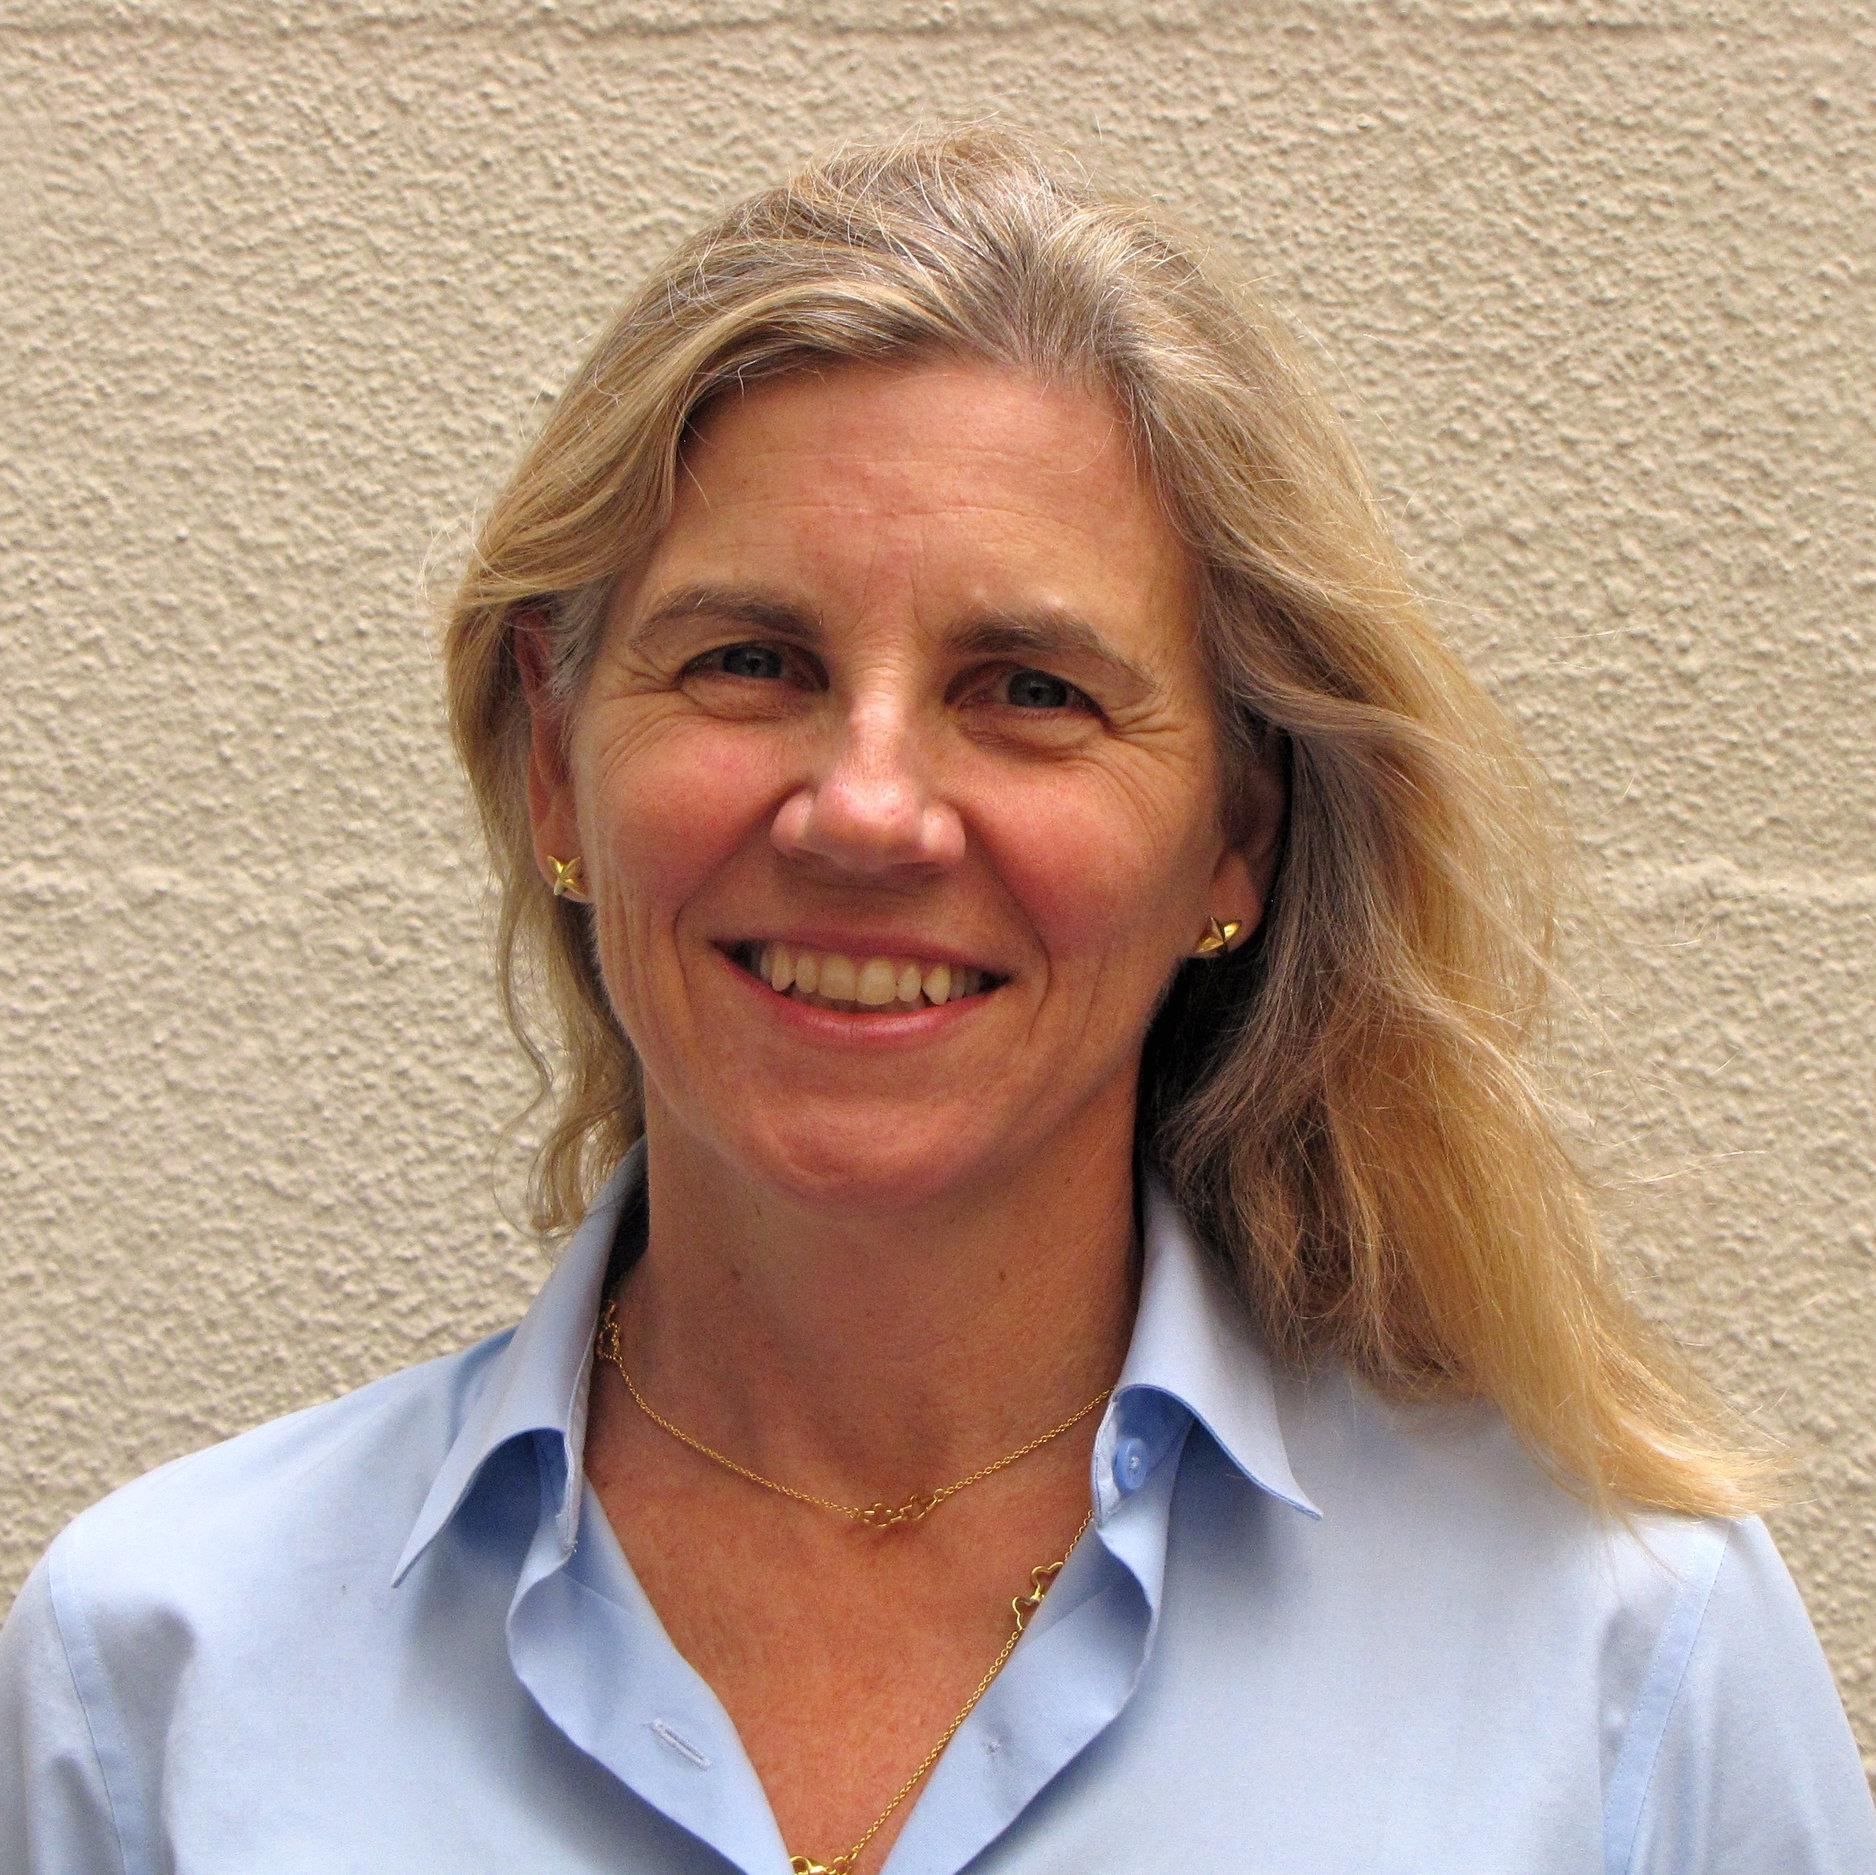 Katherine Burke - Deputy Director, Stanford Global Health